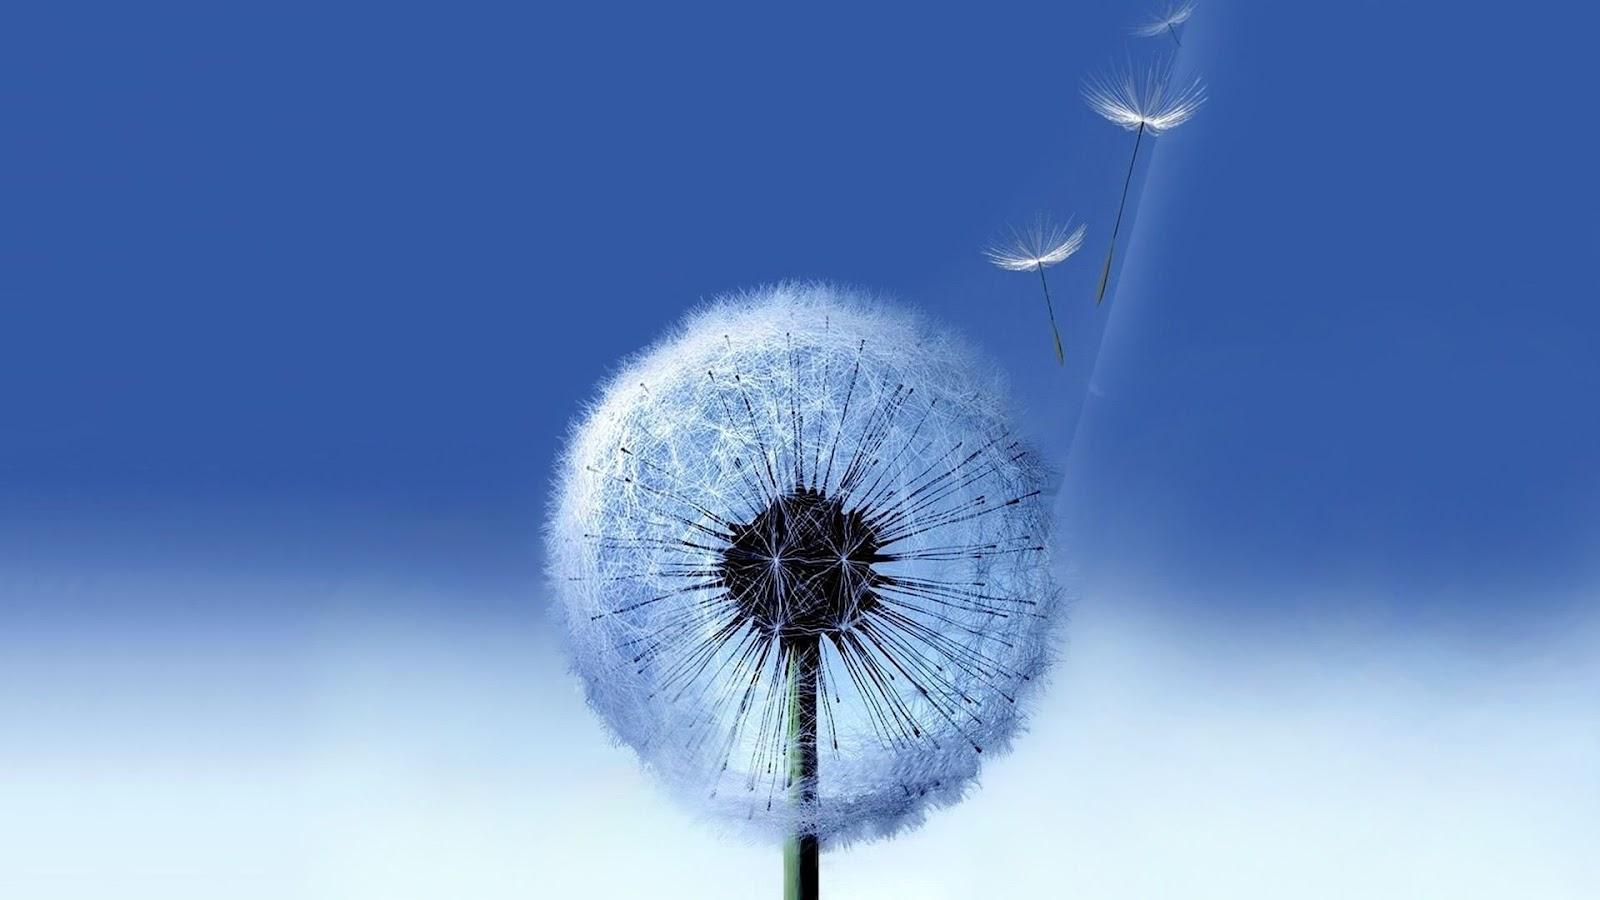 http://4.bp.blogspot.com/-yveteY4F5XU/UEhYz2TzjuI/AAAAAAAAF3c/39G7yWbeH3g/s1600/samsung-galaxy-flower-1920x1080.jpg